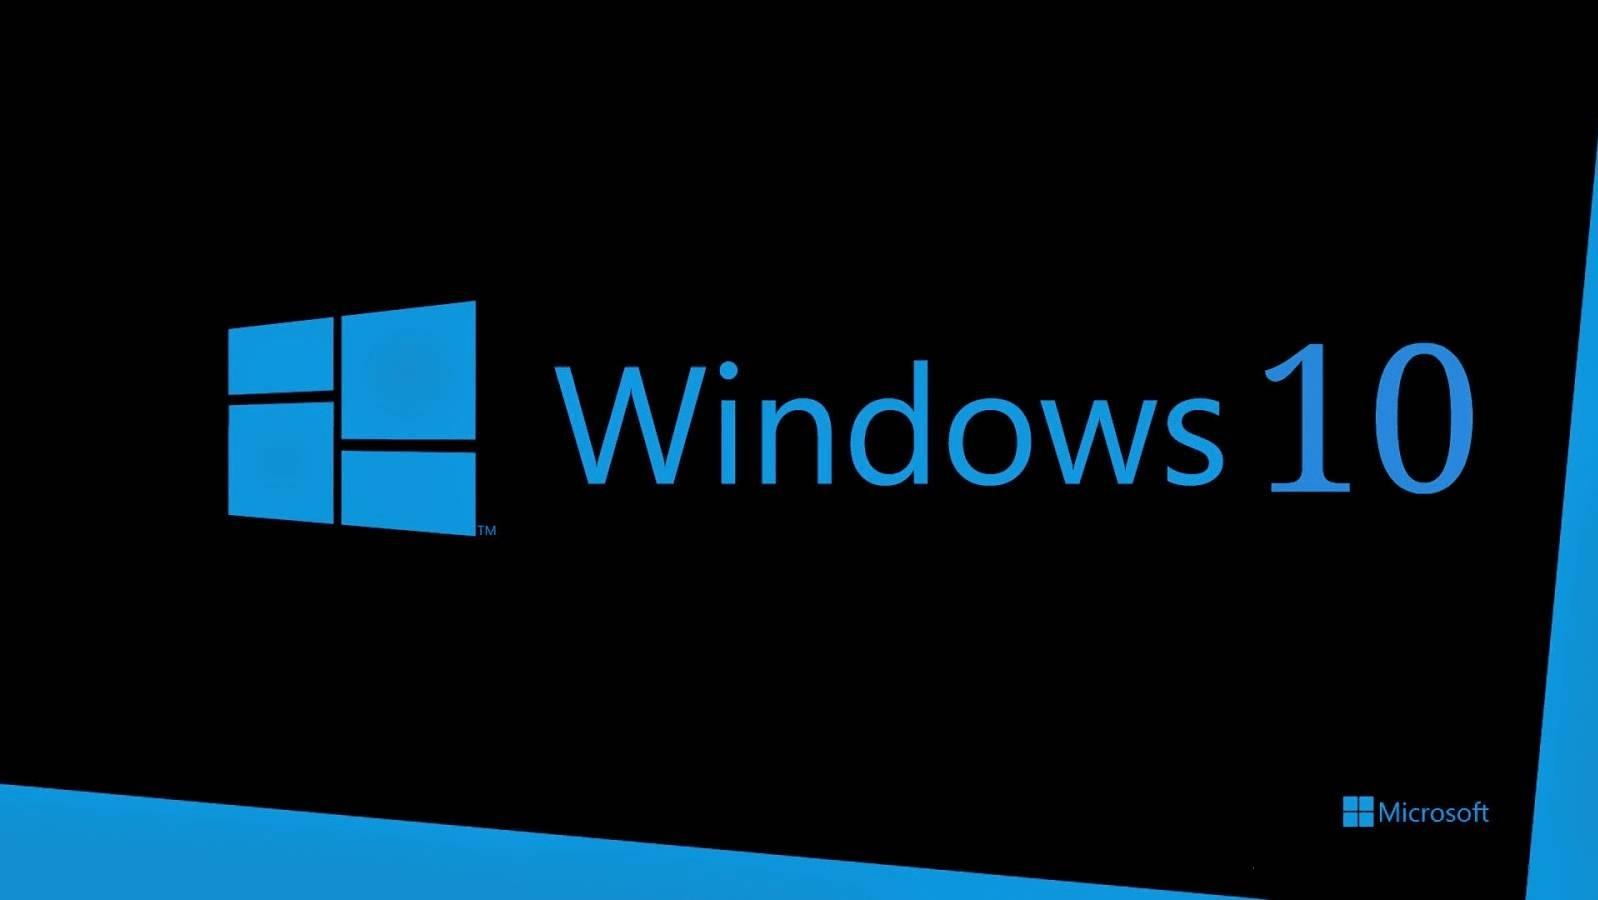 Windows 10 probleme 20h1